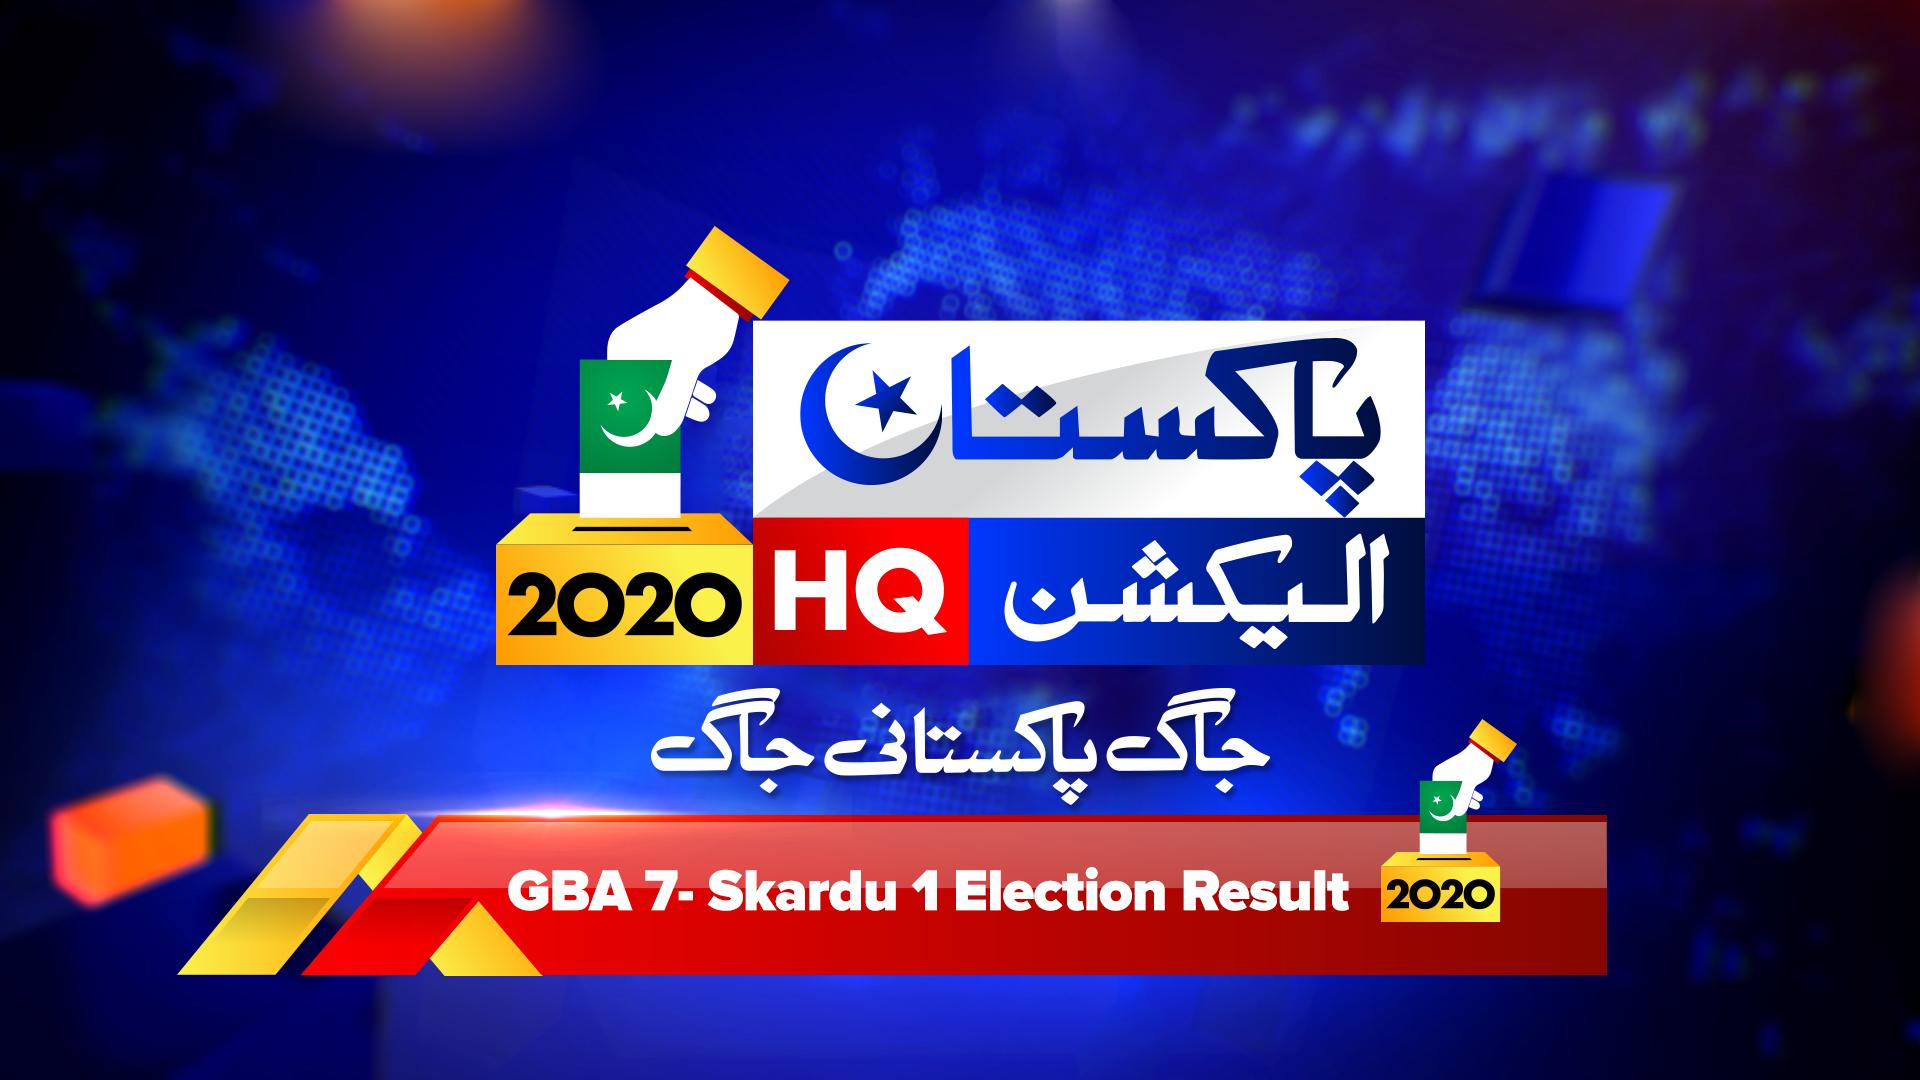 GBA 7 Gilgit 7 Election Result